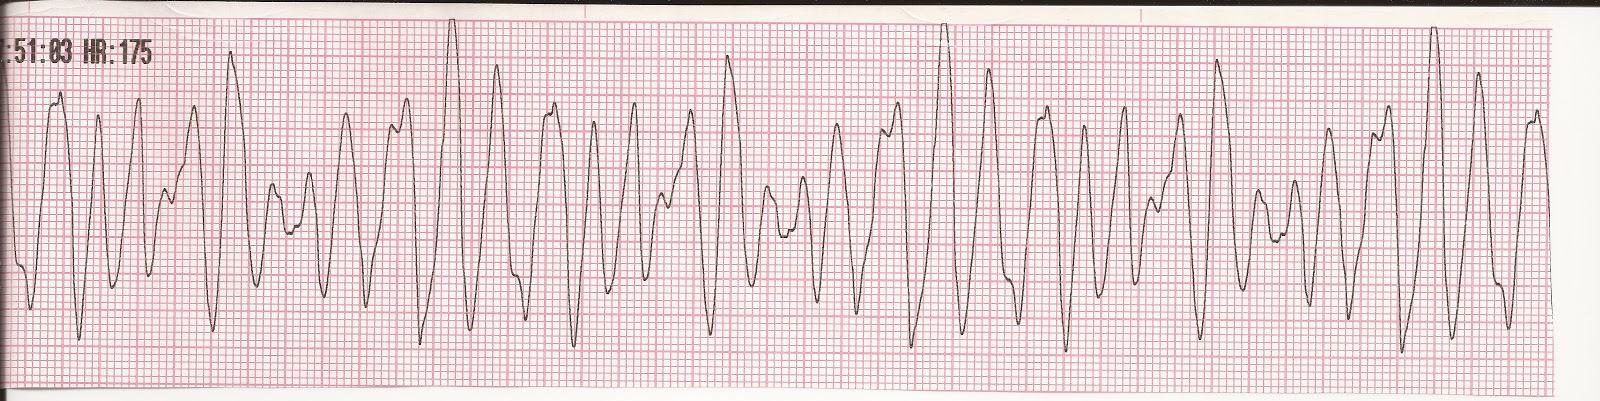 Float Nurse: ACLS Rhythms: Ventricular rhythms Ventricular Tachycardia Rhythm Strip